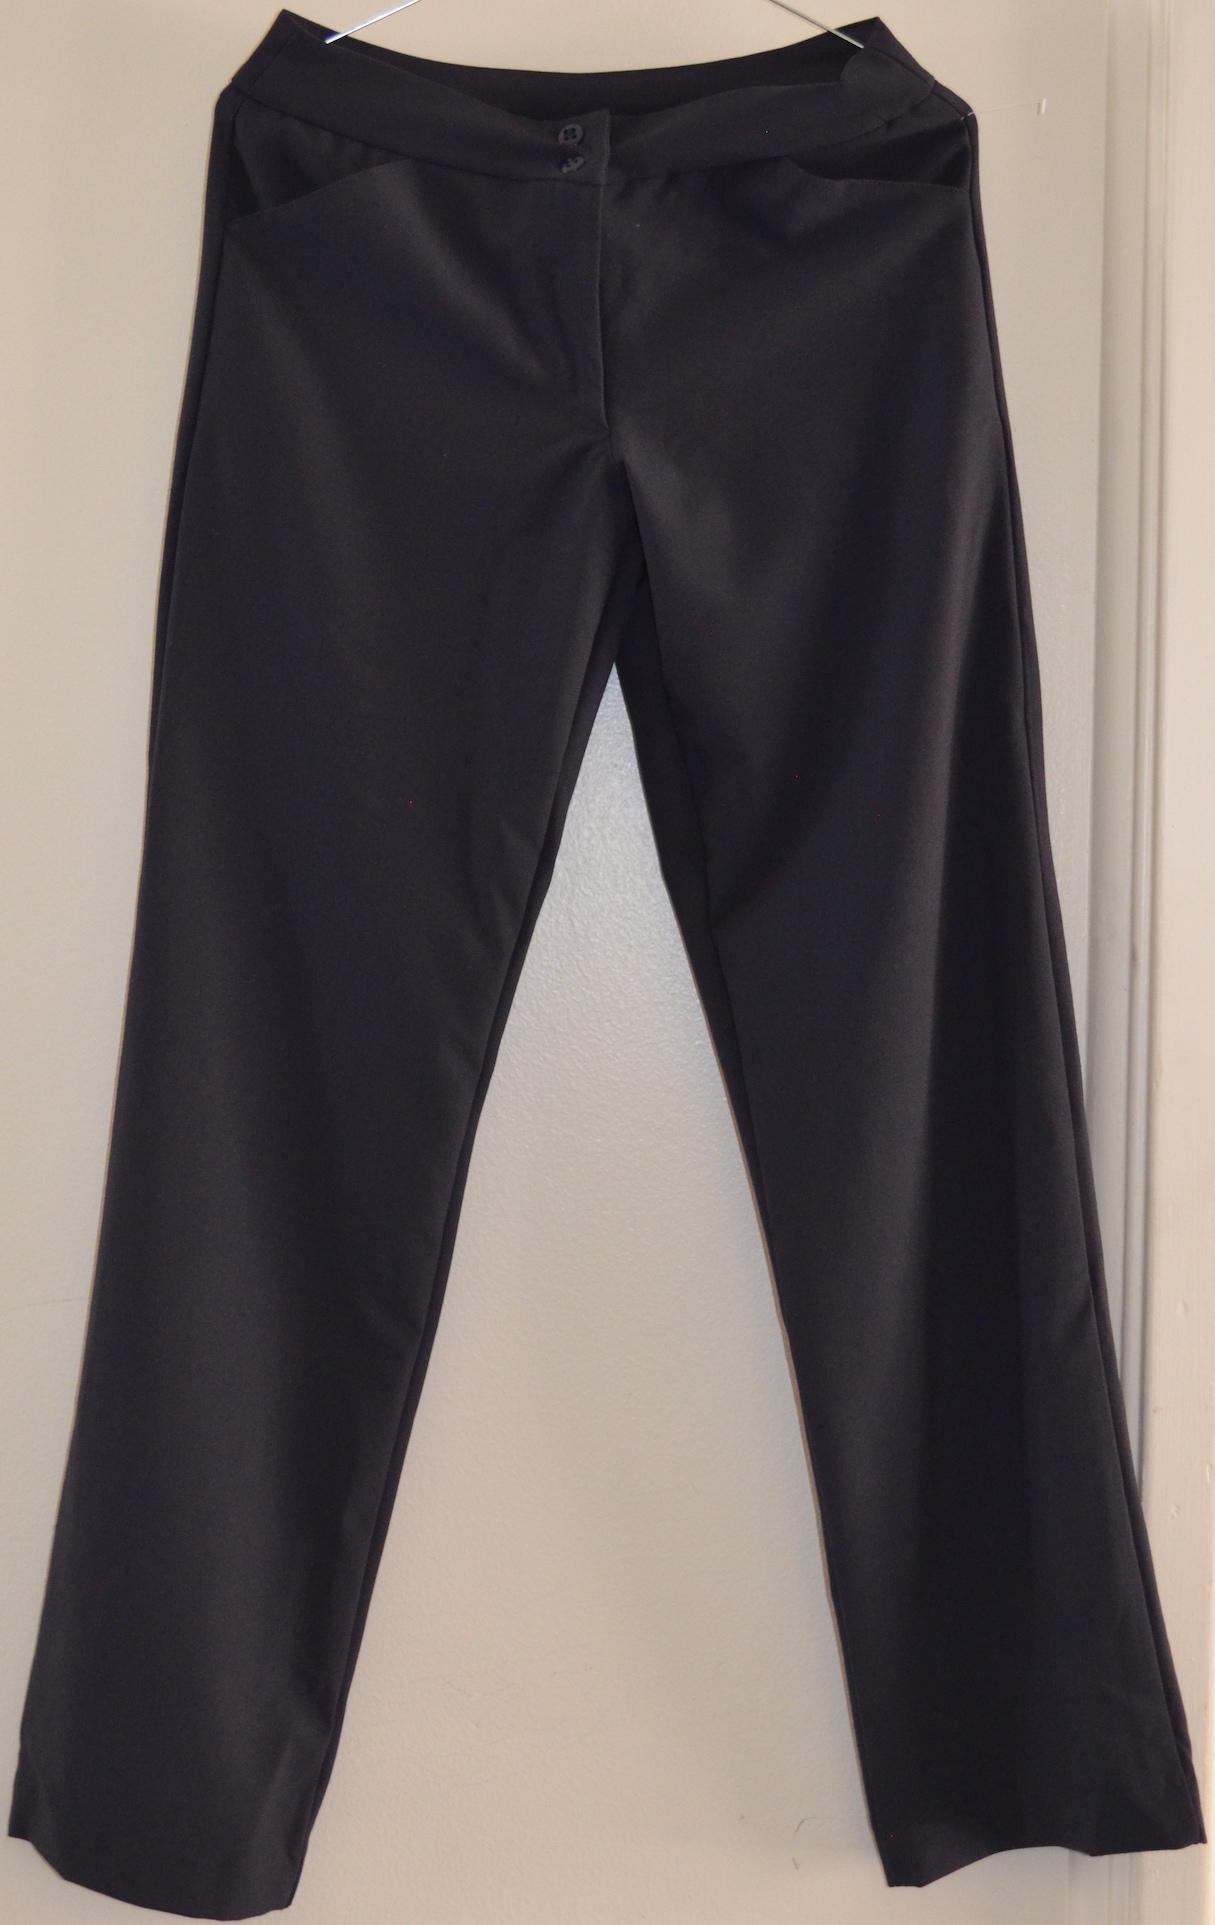 Junior girl's long pants